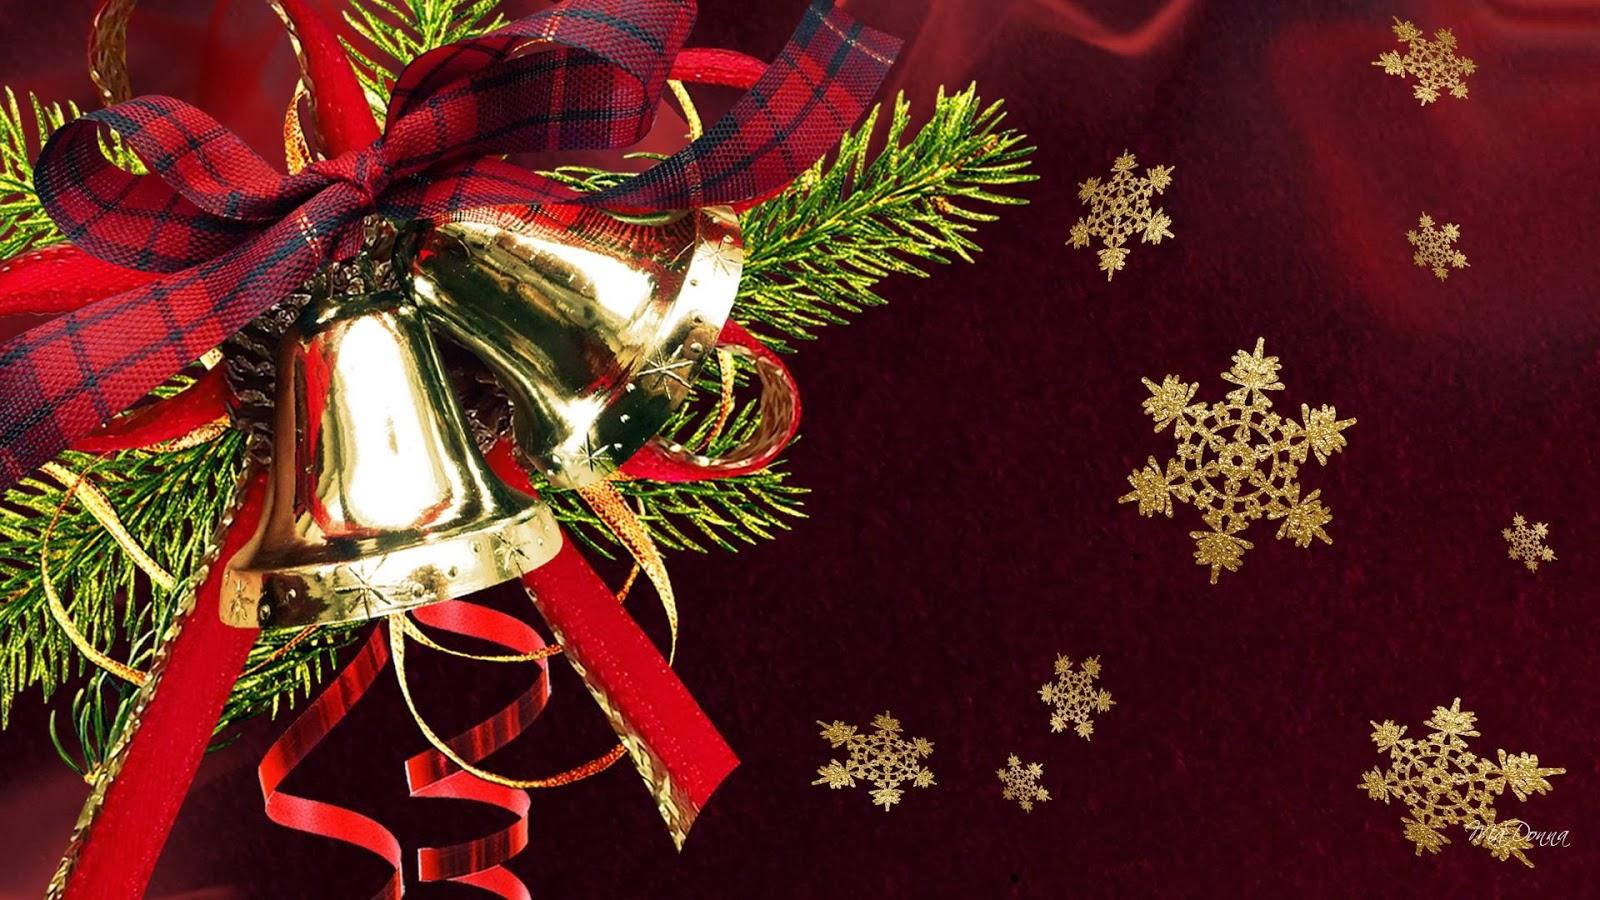 banco de imagenes 26 imgenes navideas muy creativas christmas amazing pictures